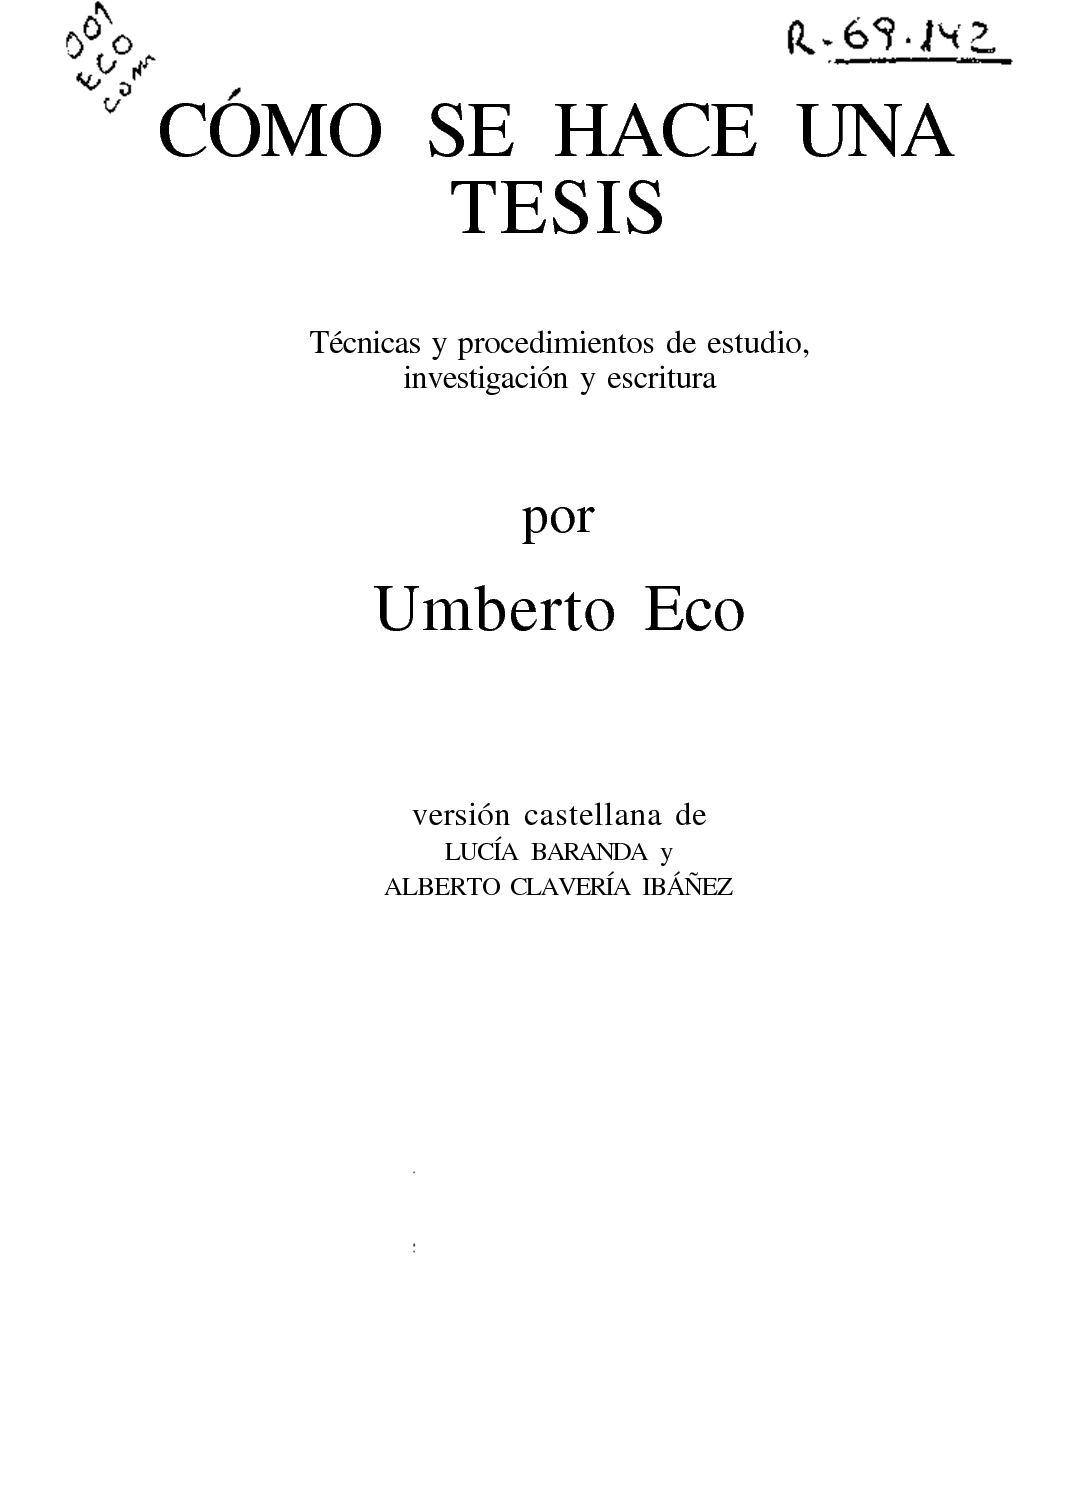 Calaméo - Como Hacer Una Tesis Umberto Eco